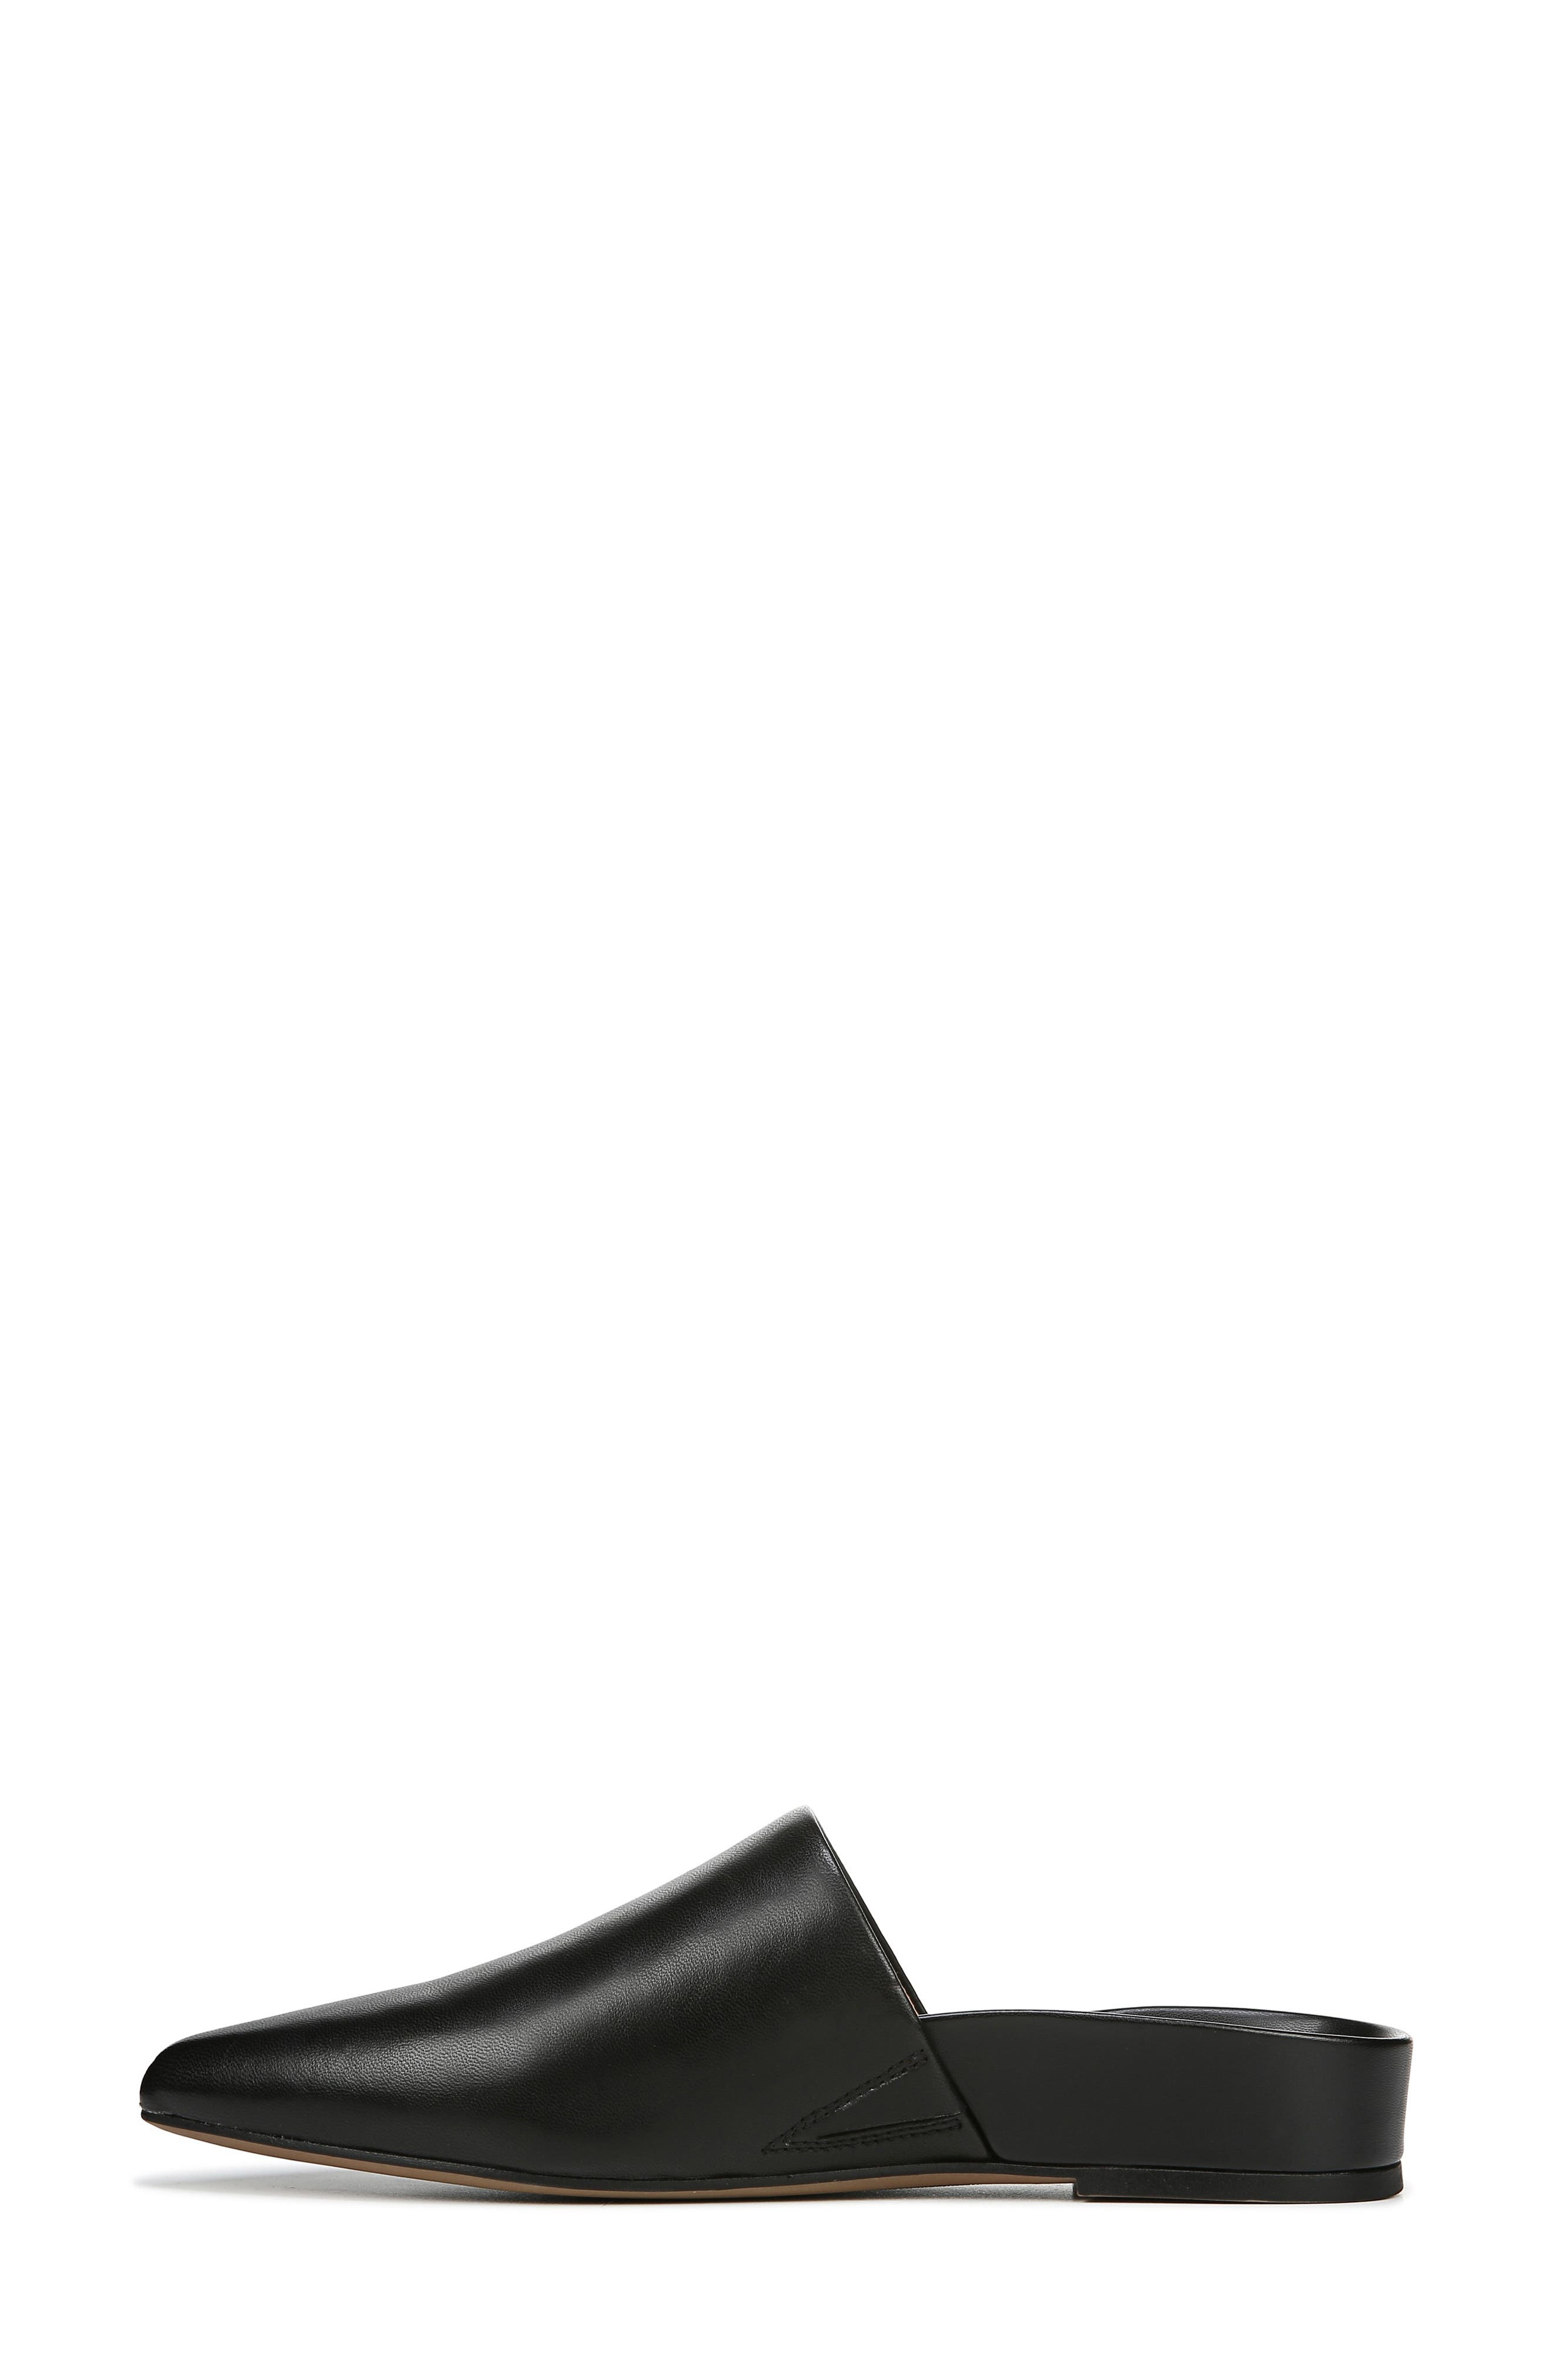 SARTO BY FRANCO SARTO,                             Irma Pointy Toe Mule,                             Alternate thumbnail 9, color,                             BLACK LEATHER